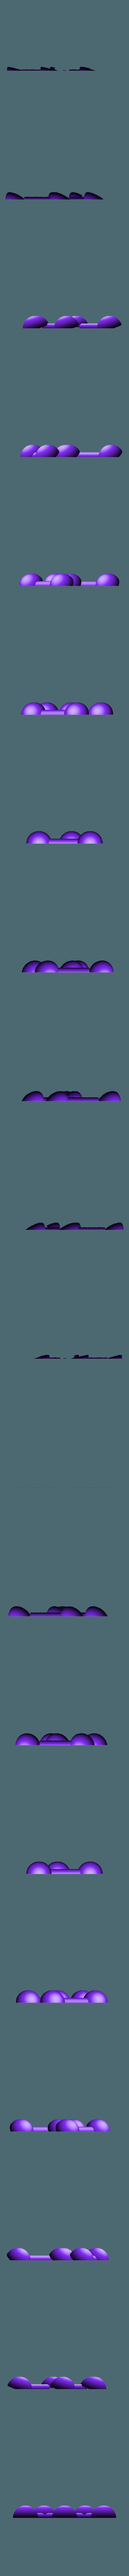 Manchete_split_02.stl Download free STL file Rede Manchete logo • 3D printer design, CapAwsome